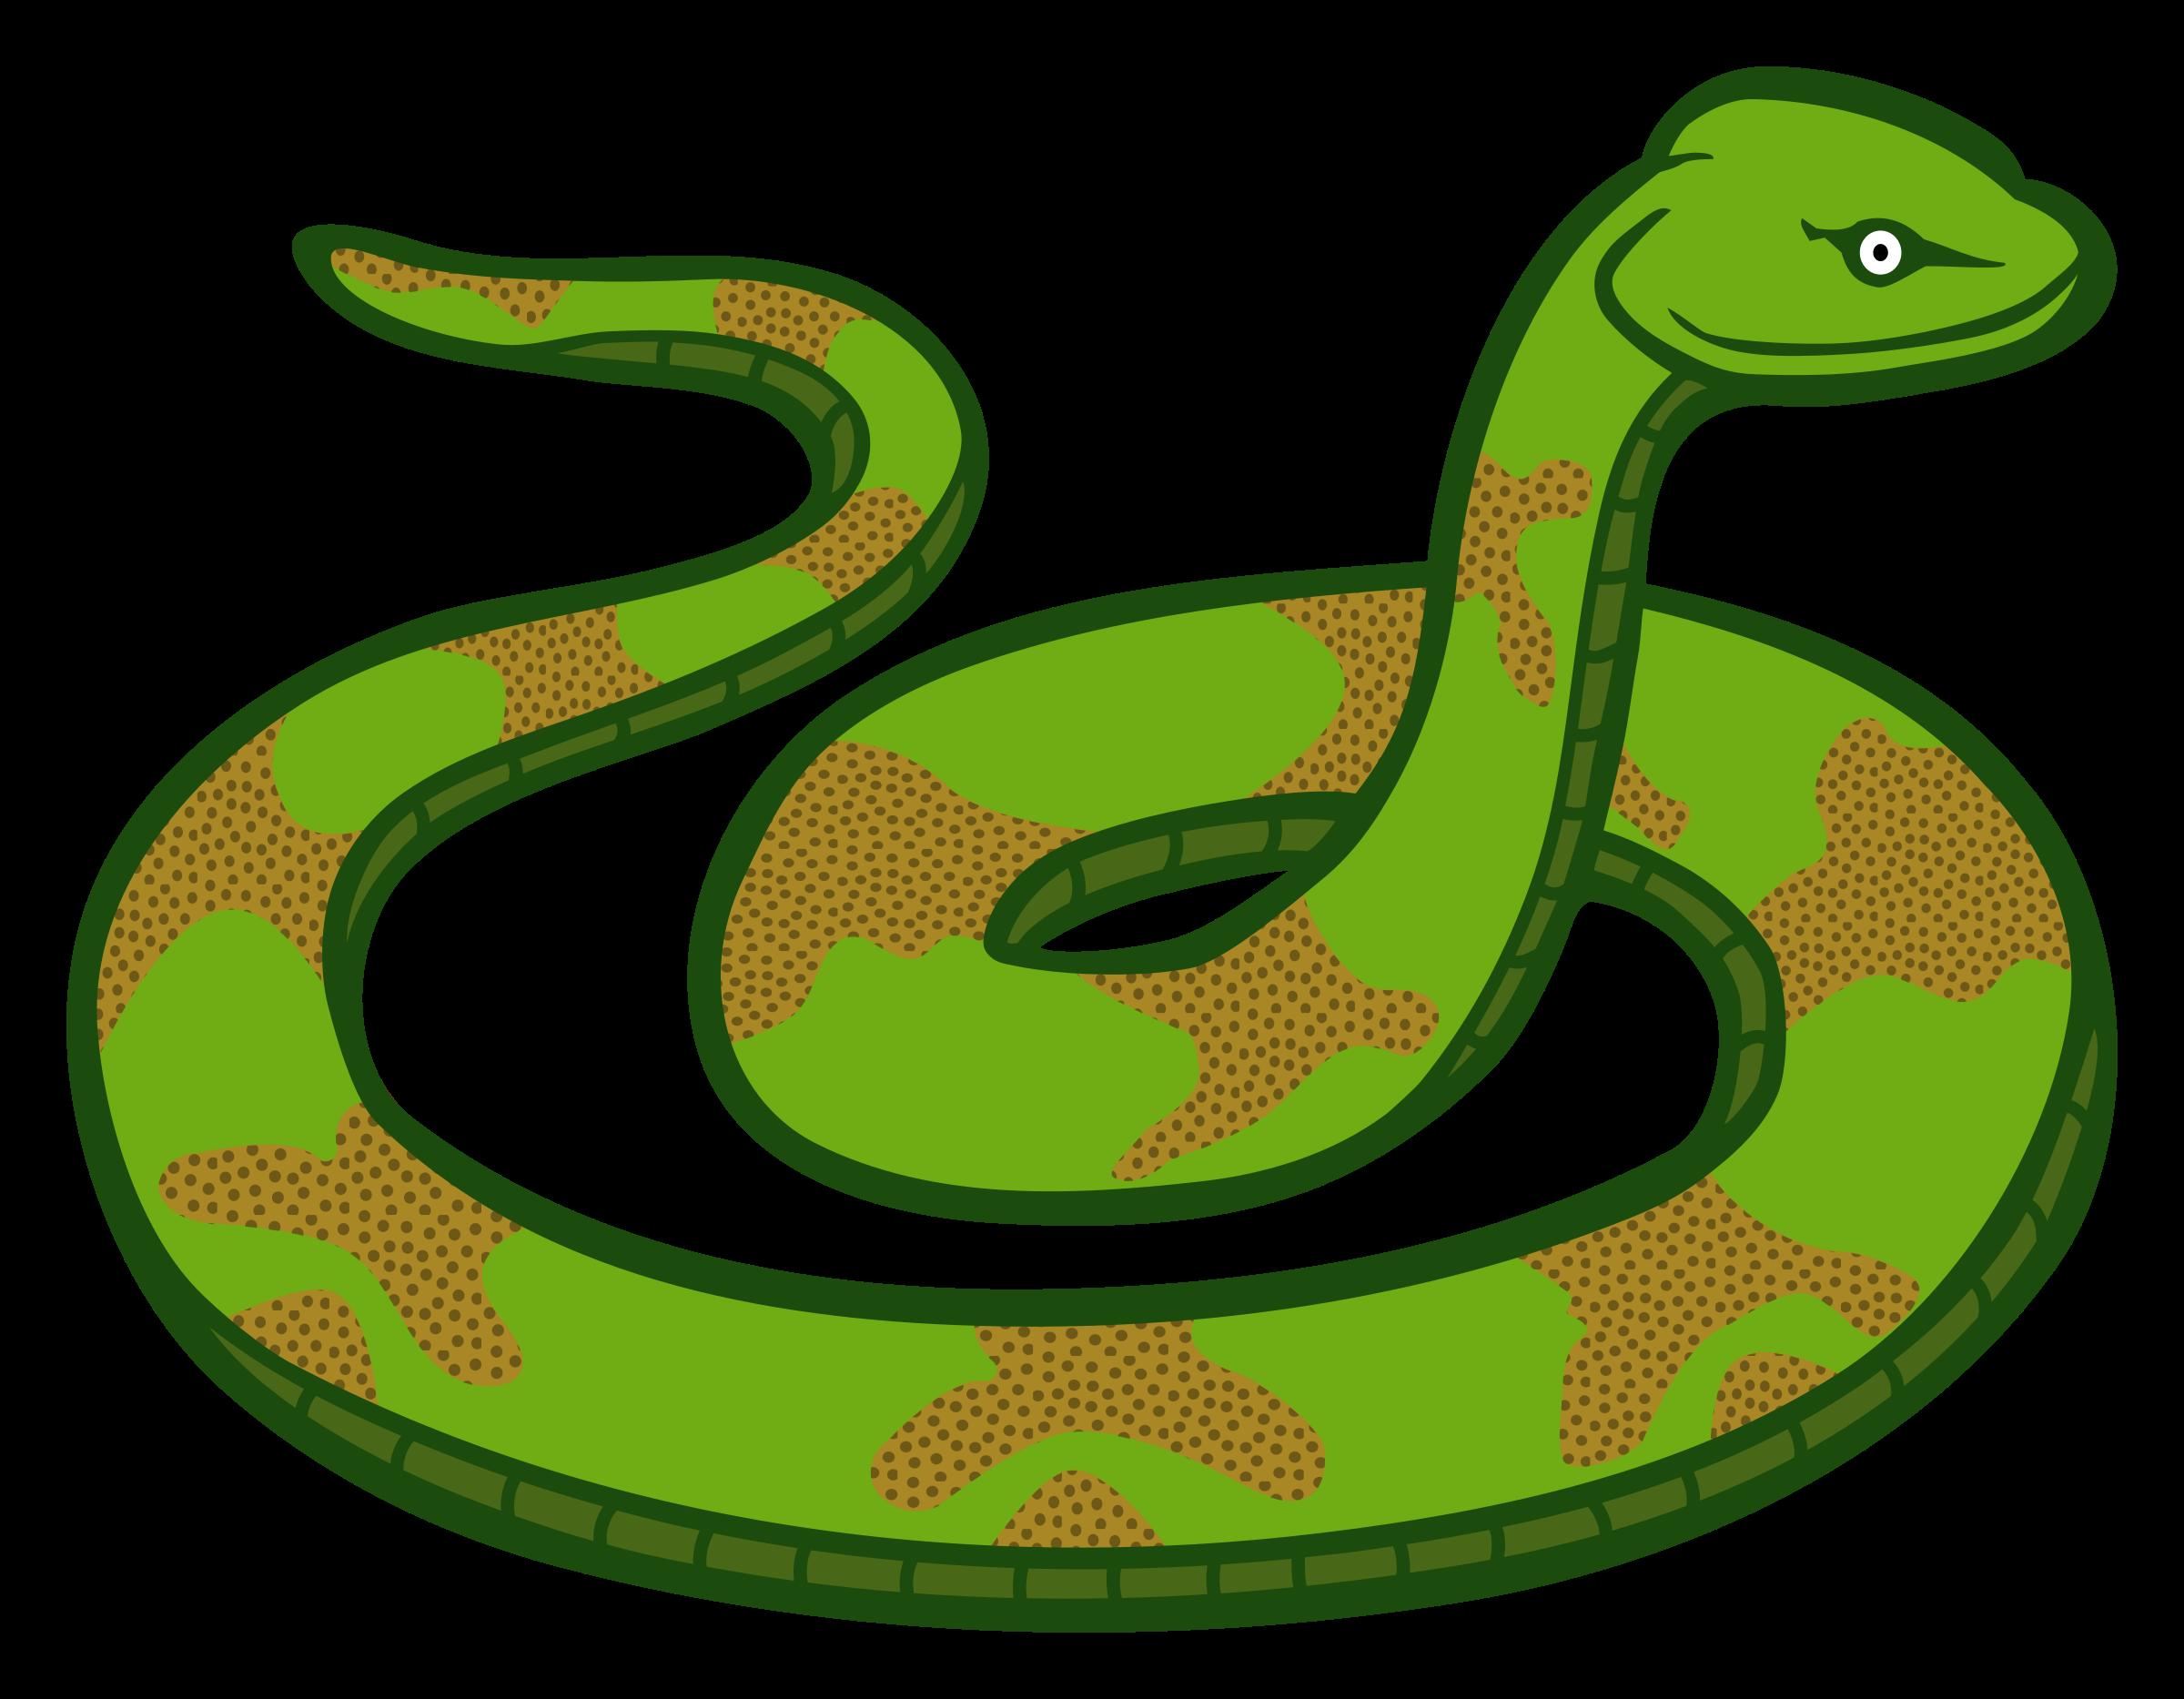 Transparent snake clipart 2 - Snake Clip Art